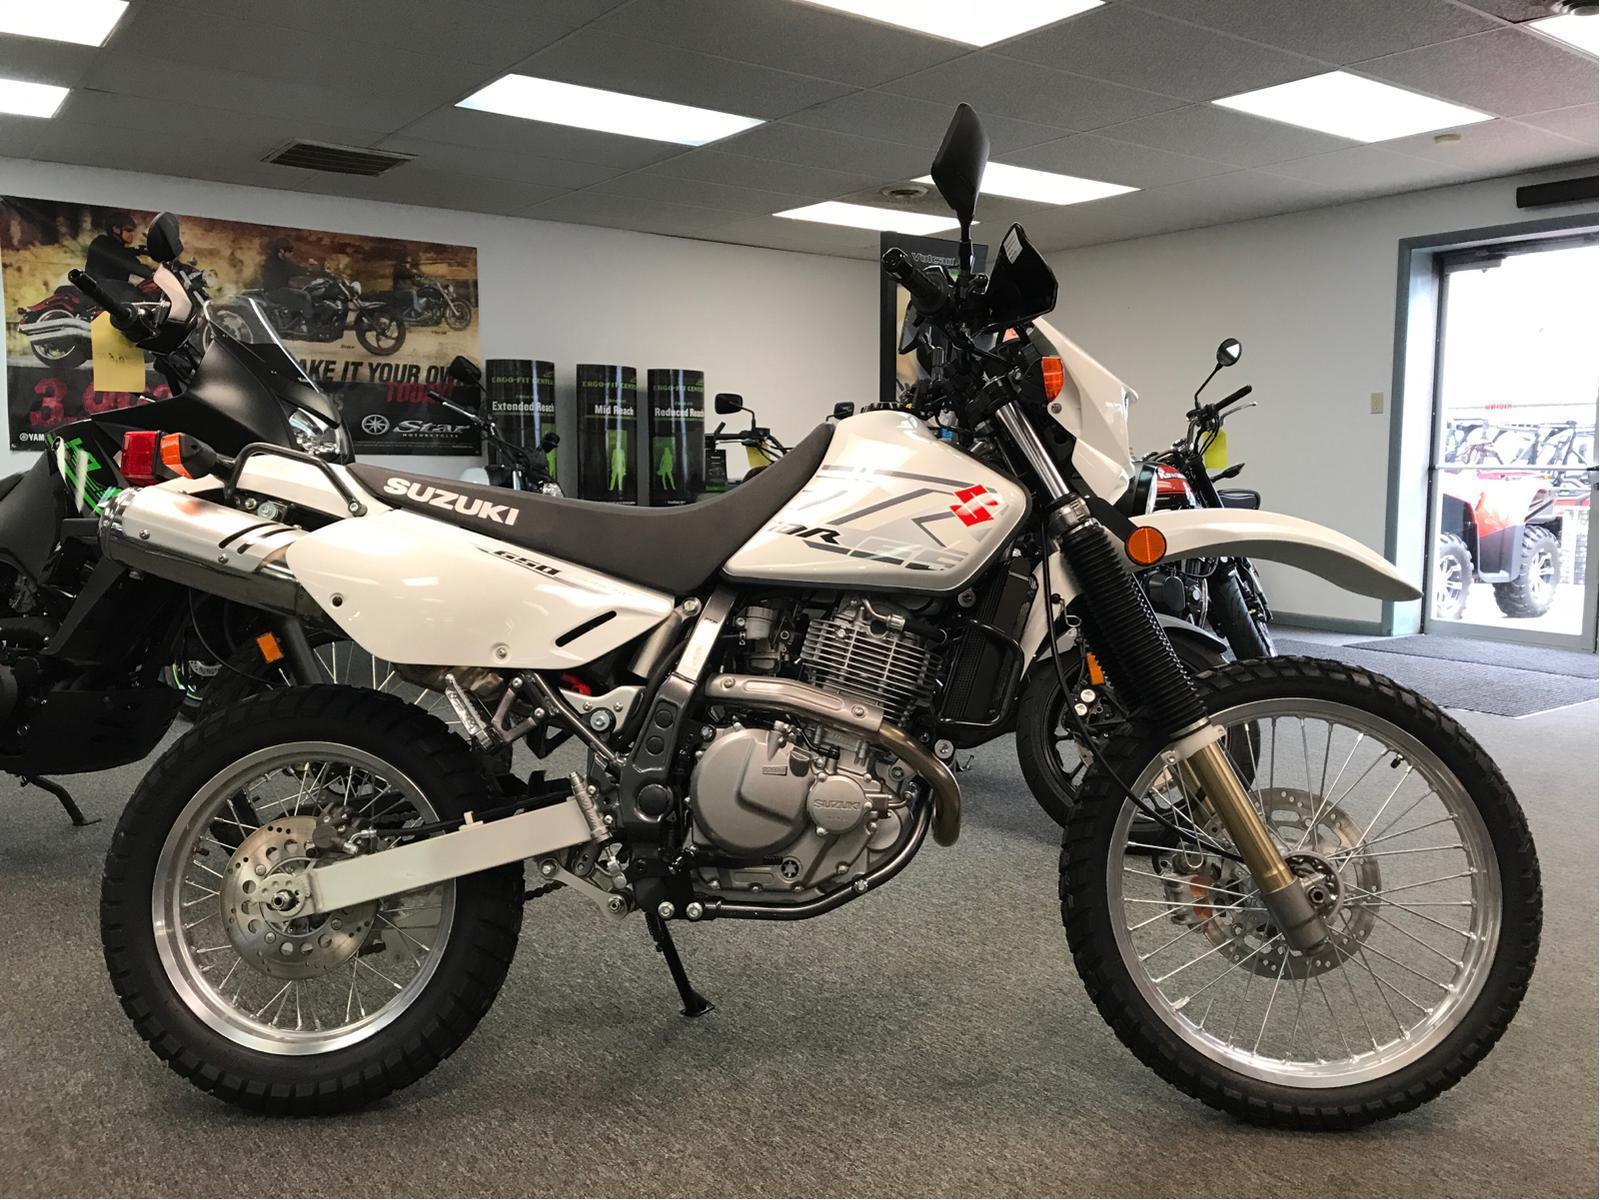 2018 Suzuki DR650S for sale in Urbana, IL | Sportland Motorsports ...